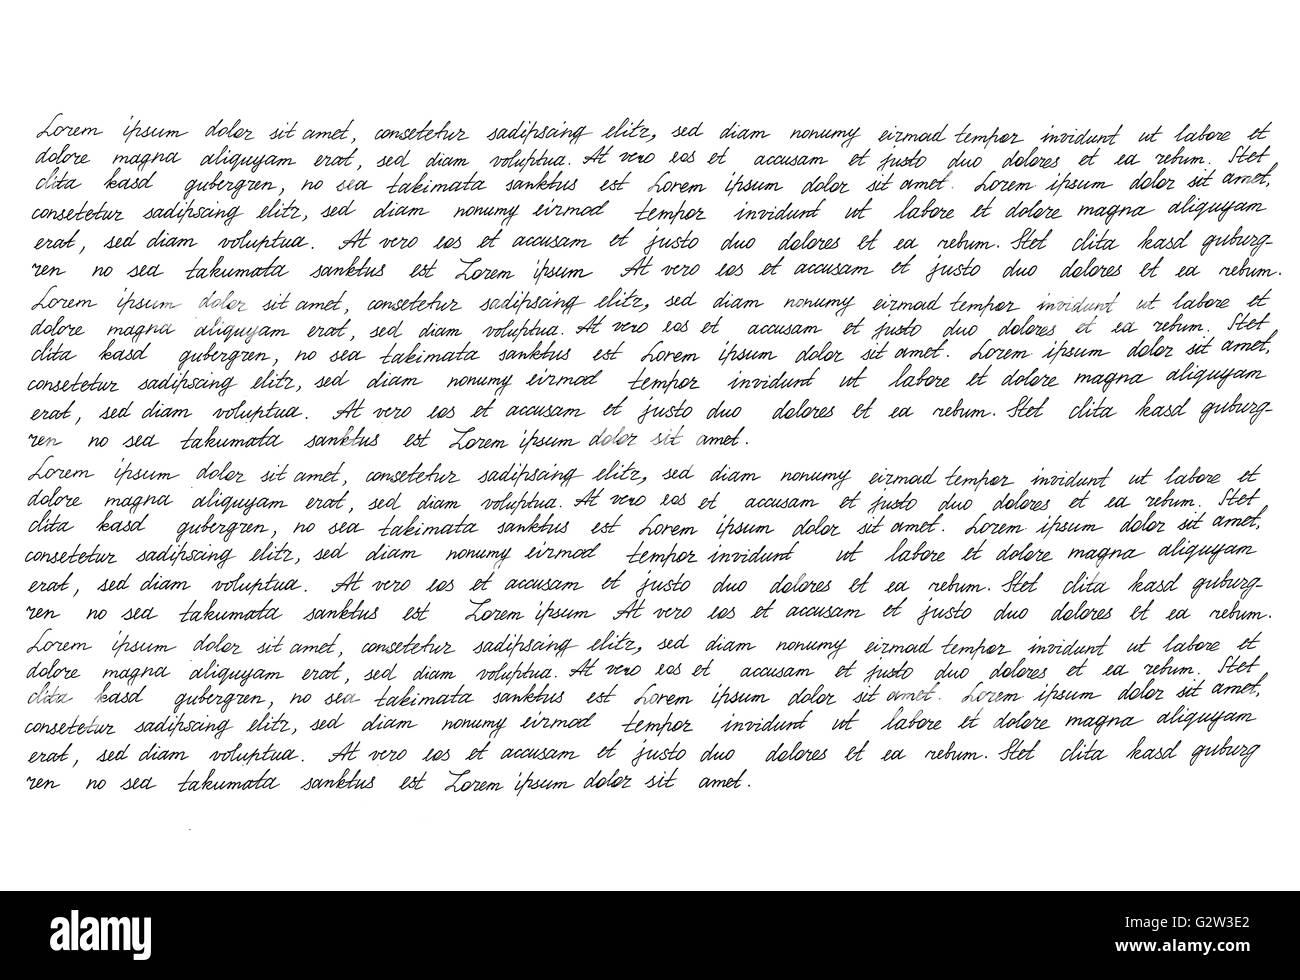 Calligraphic handwritten script. Handwriting. Manuscript. Script. Font. Latin text Lorem ipsum. Abstract texture - Stock Image